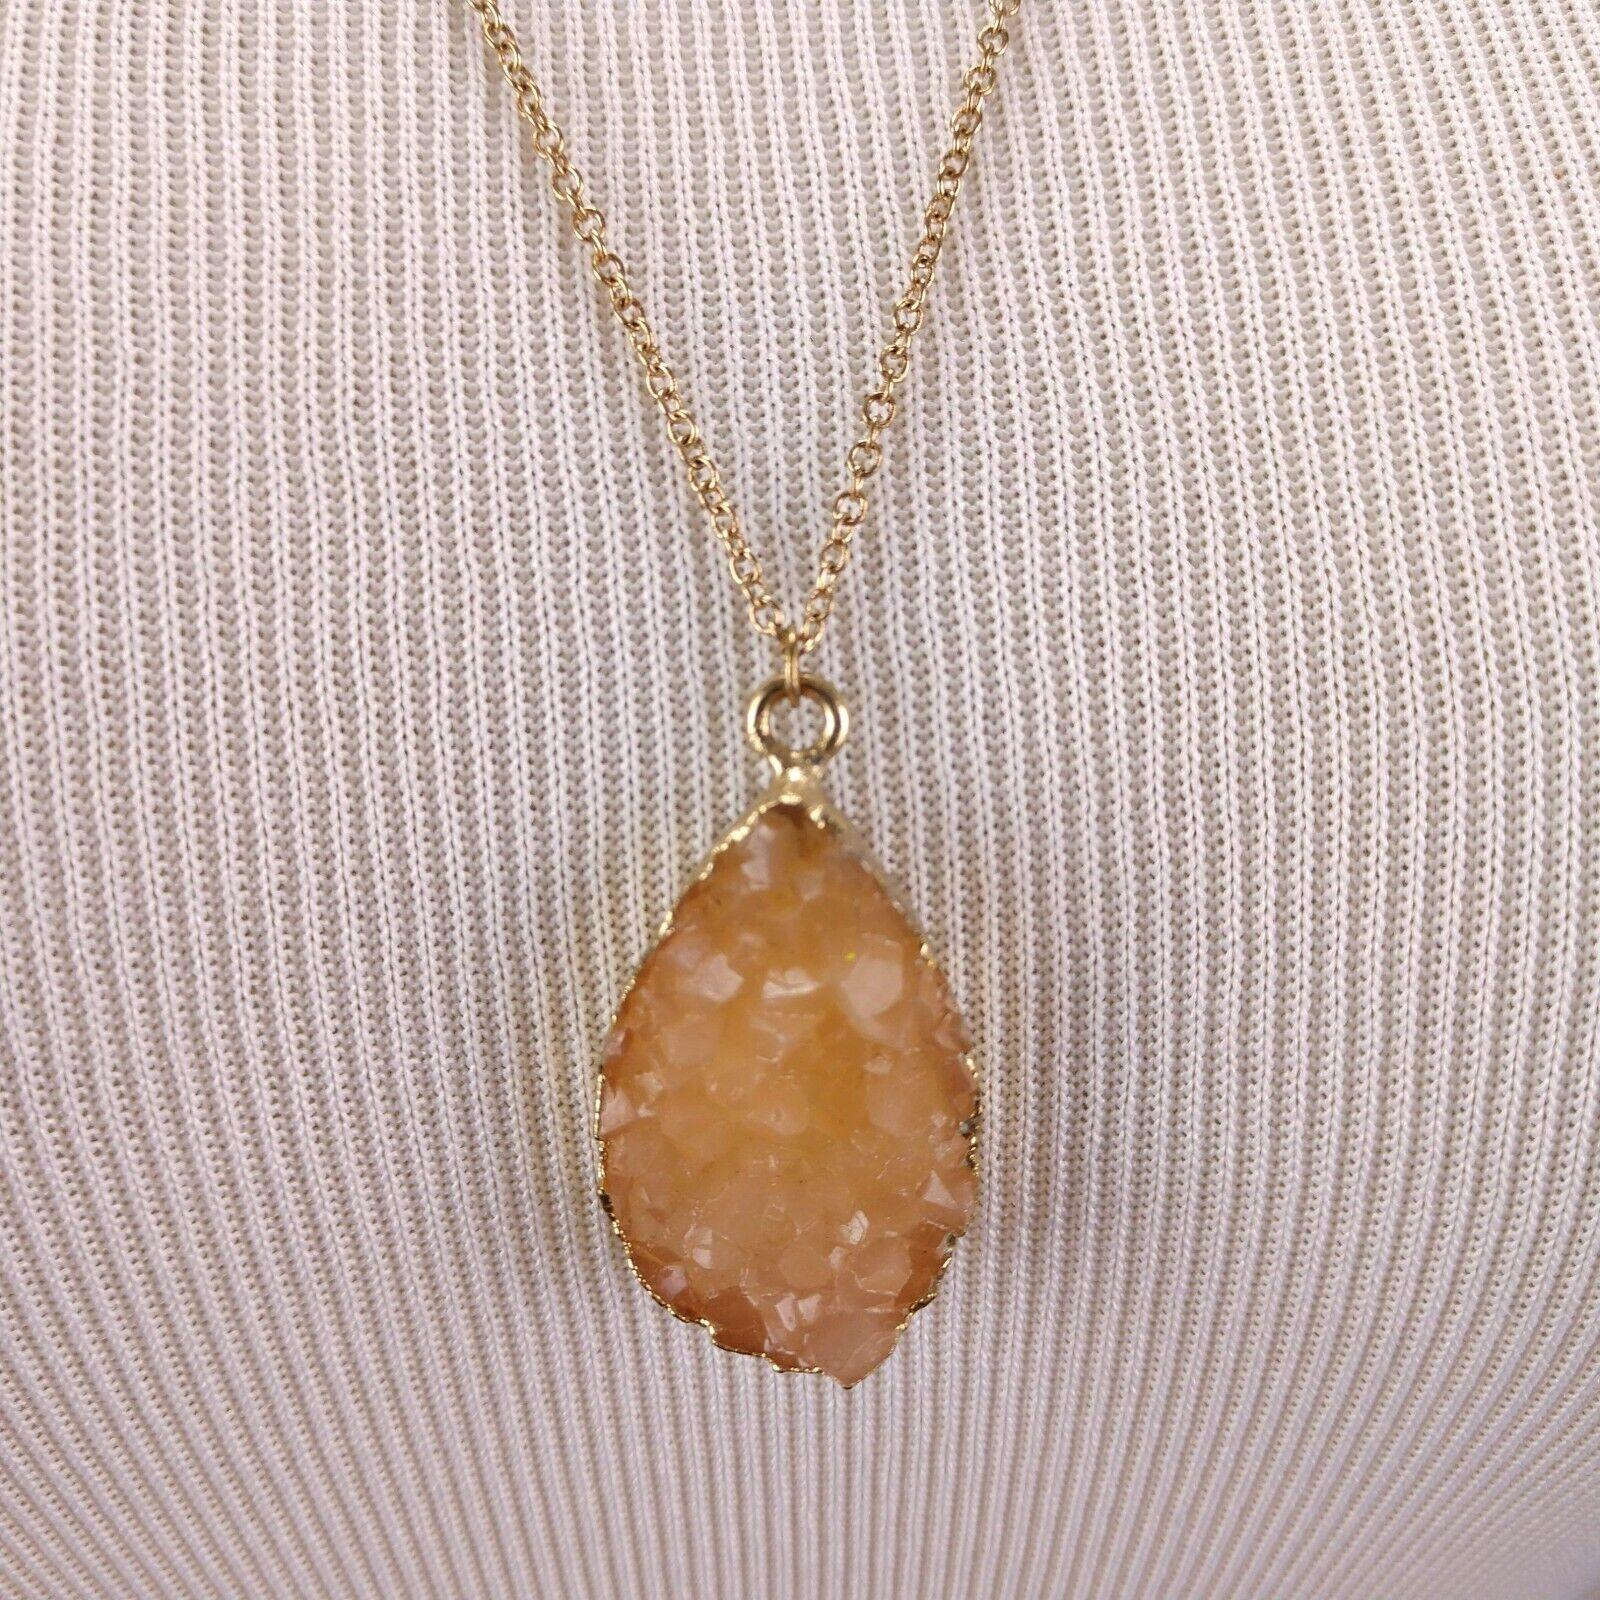 Gold Dipped Citrine Quartz Raw Geode Pendant Neck… - image 1